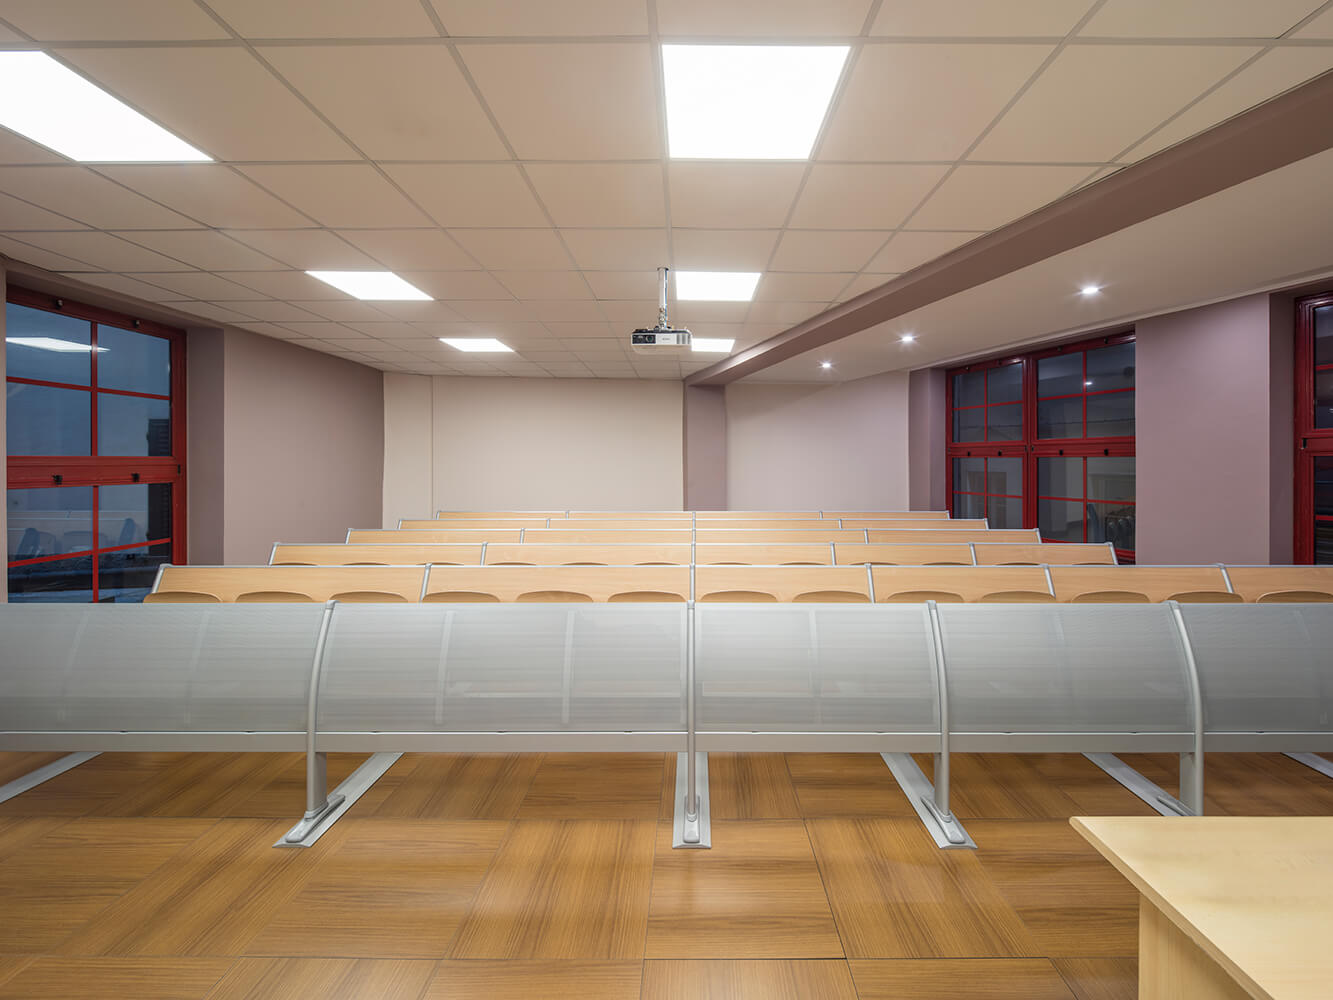 univertsita-studi-di-genova-q3000-study-bench-by-lamm-cop